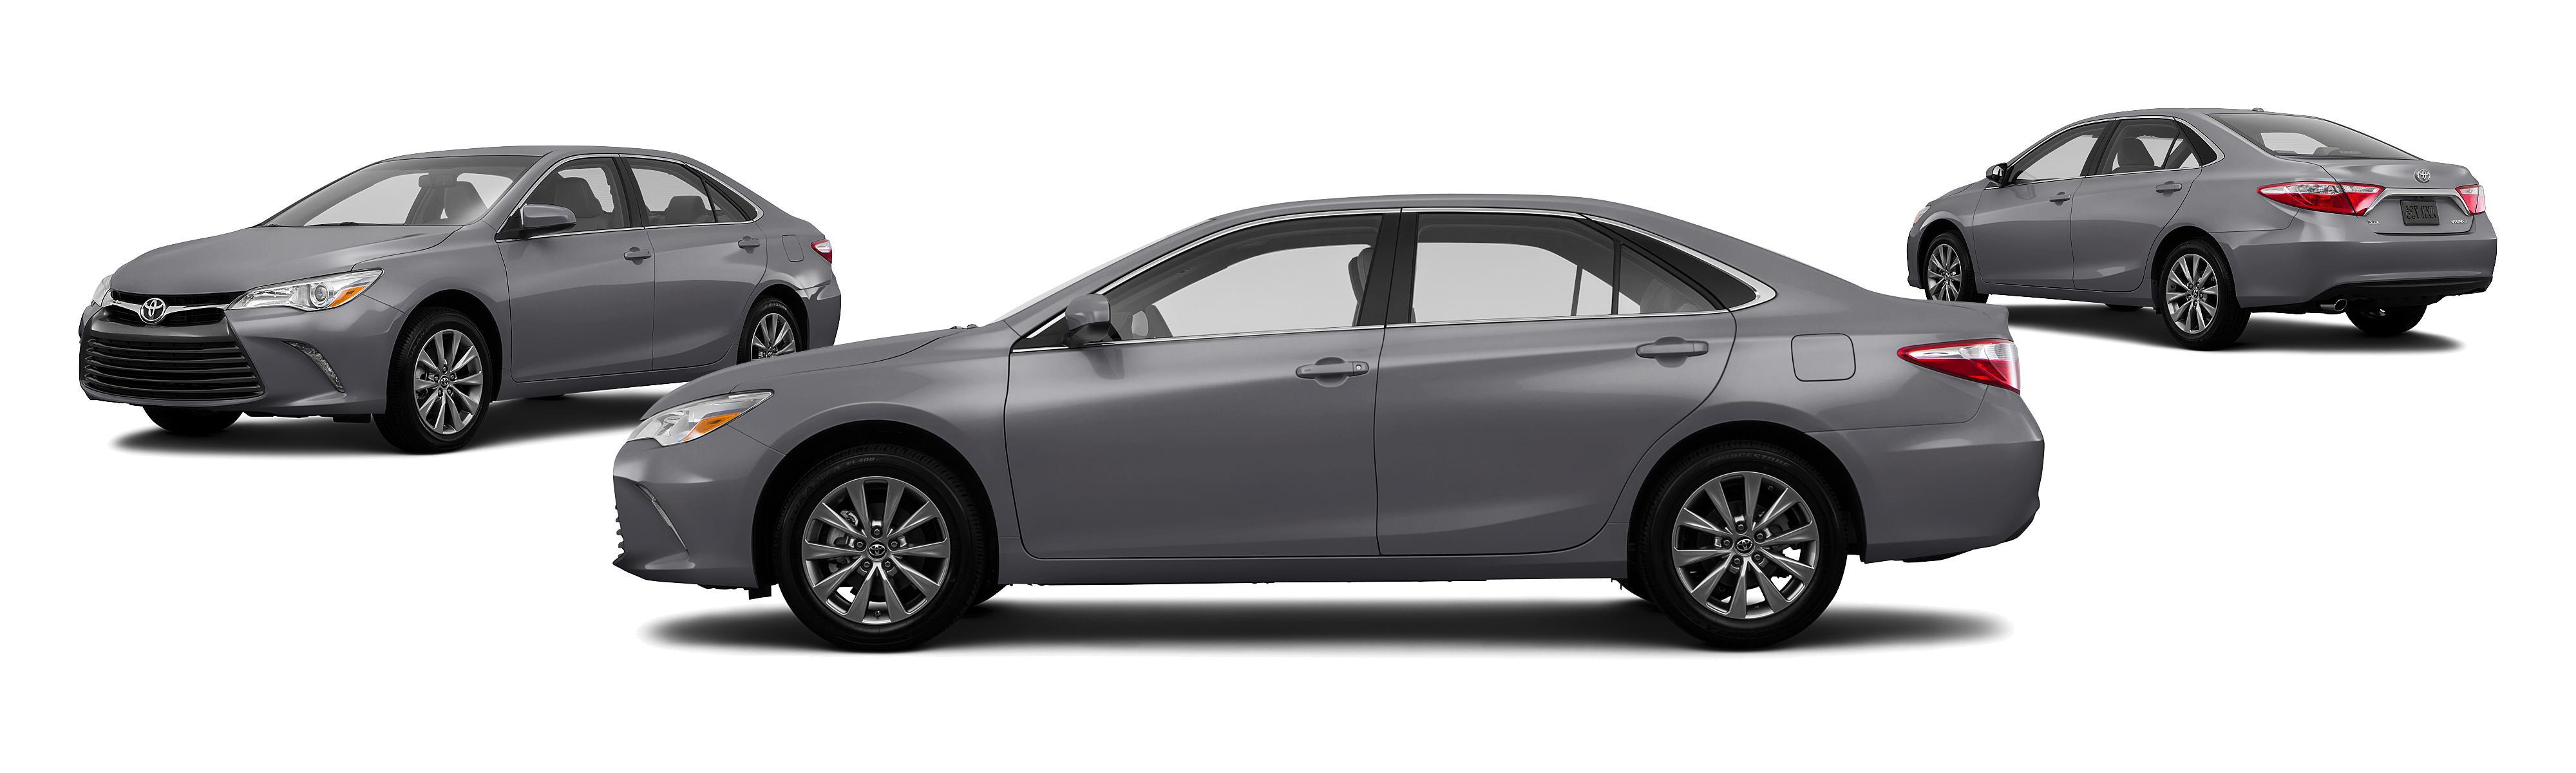 com hyundai car vs autoguide comparisons toyota camry sonata news xle comparison